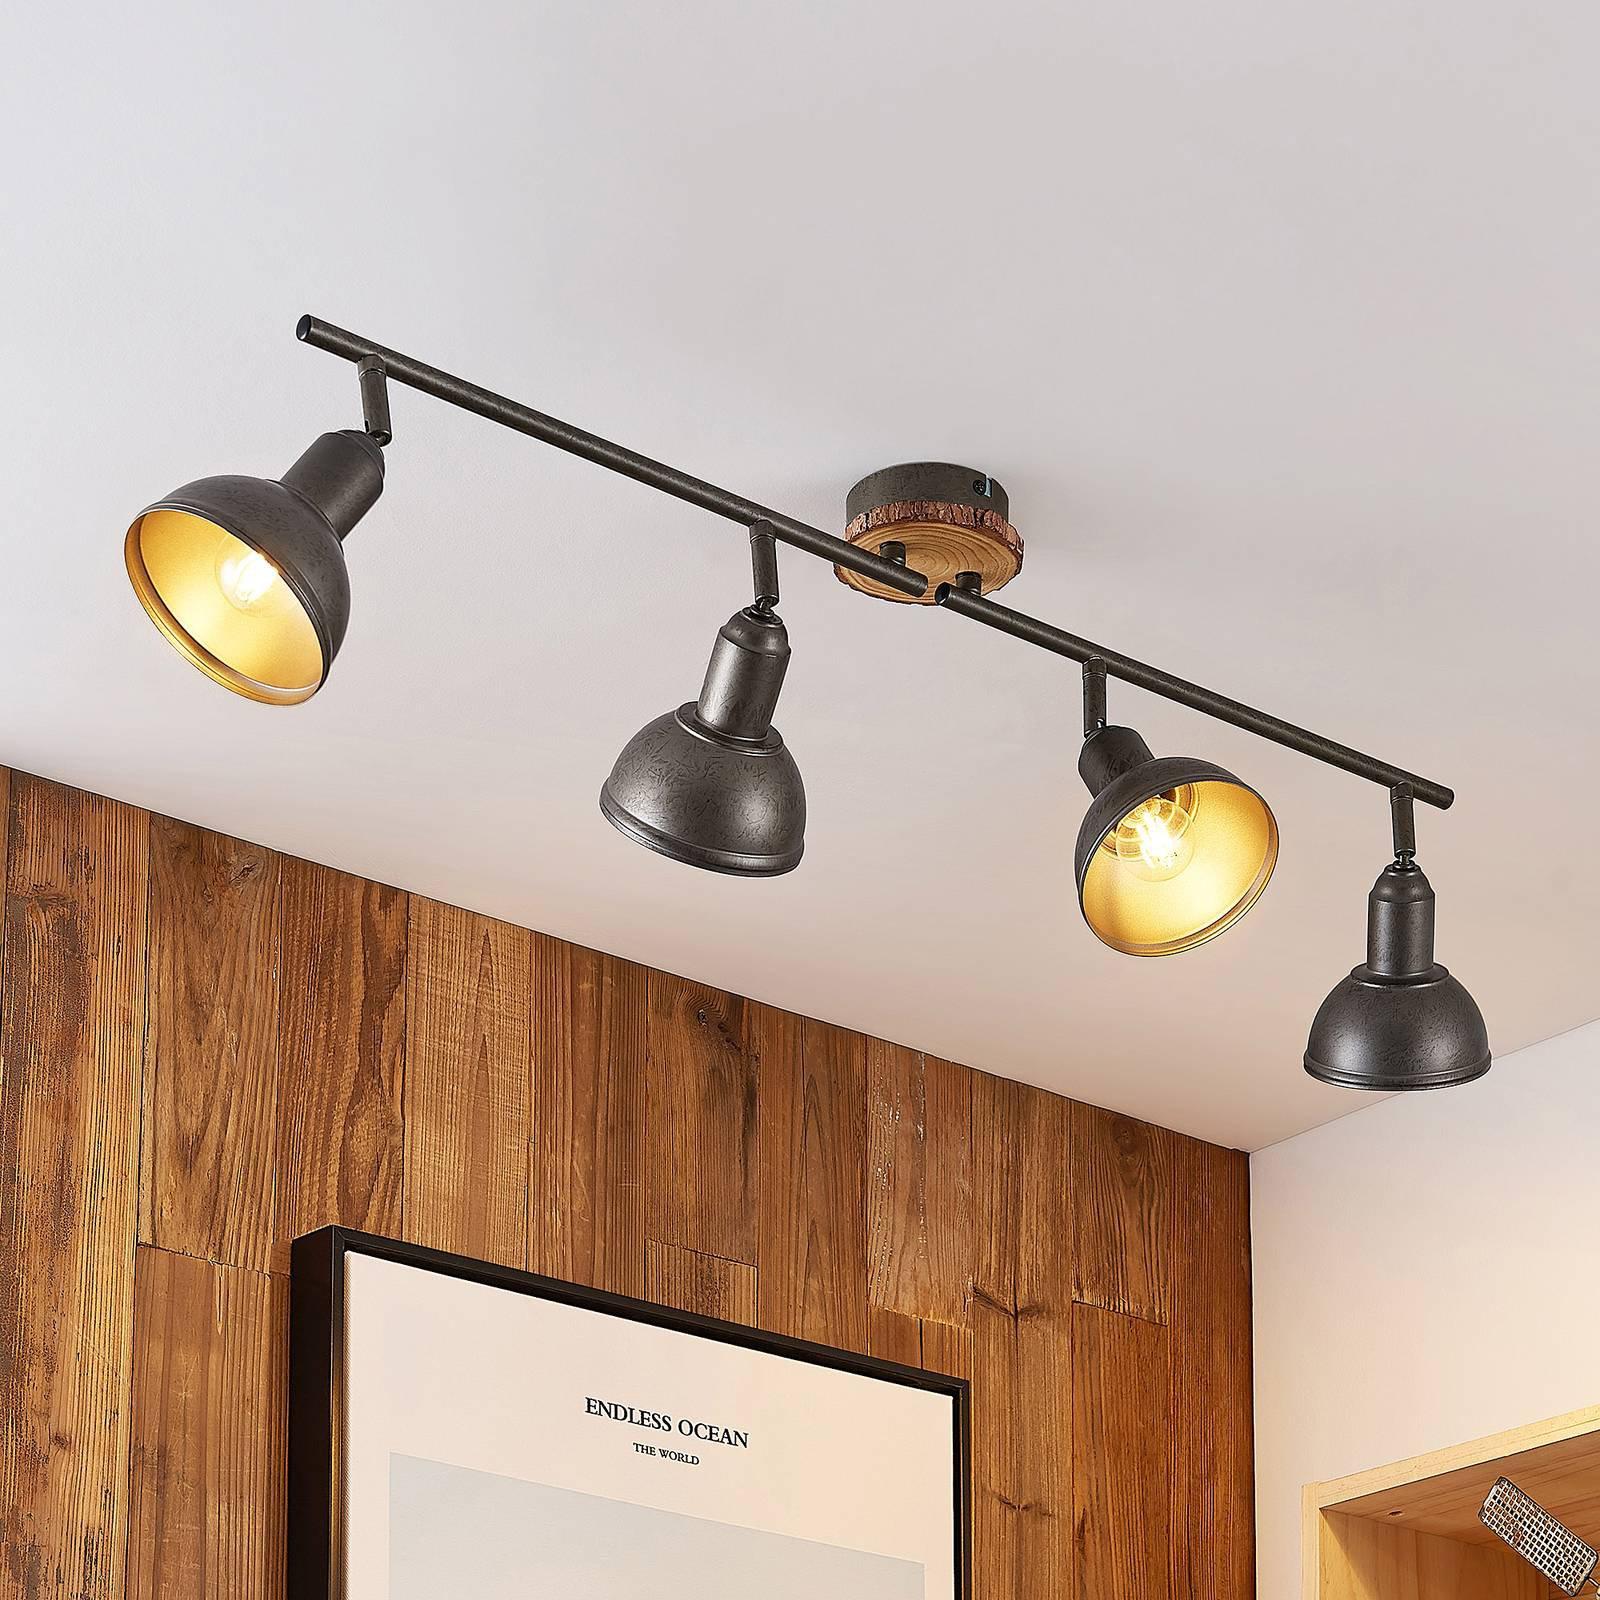 Lindby Nesrin taklampe med treskive, 4 lyskilder